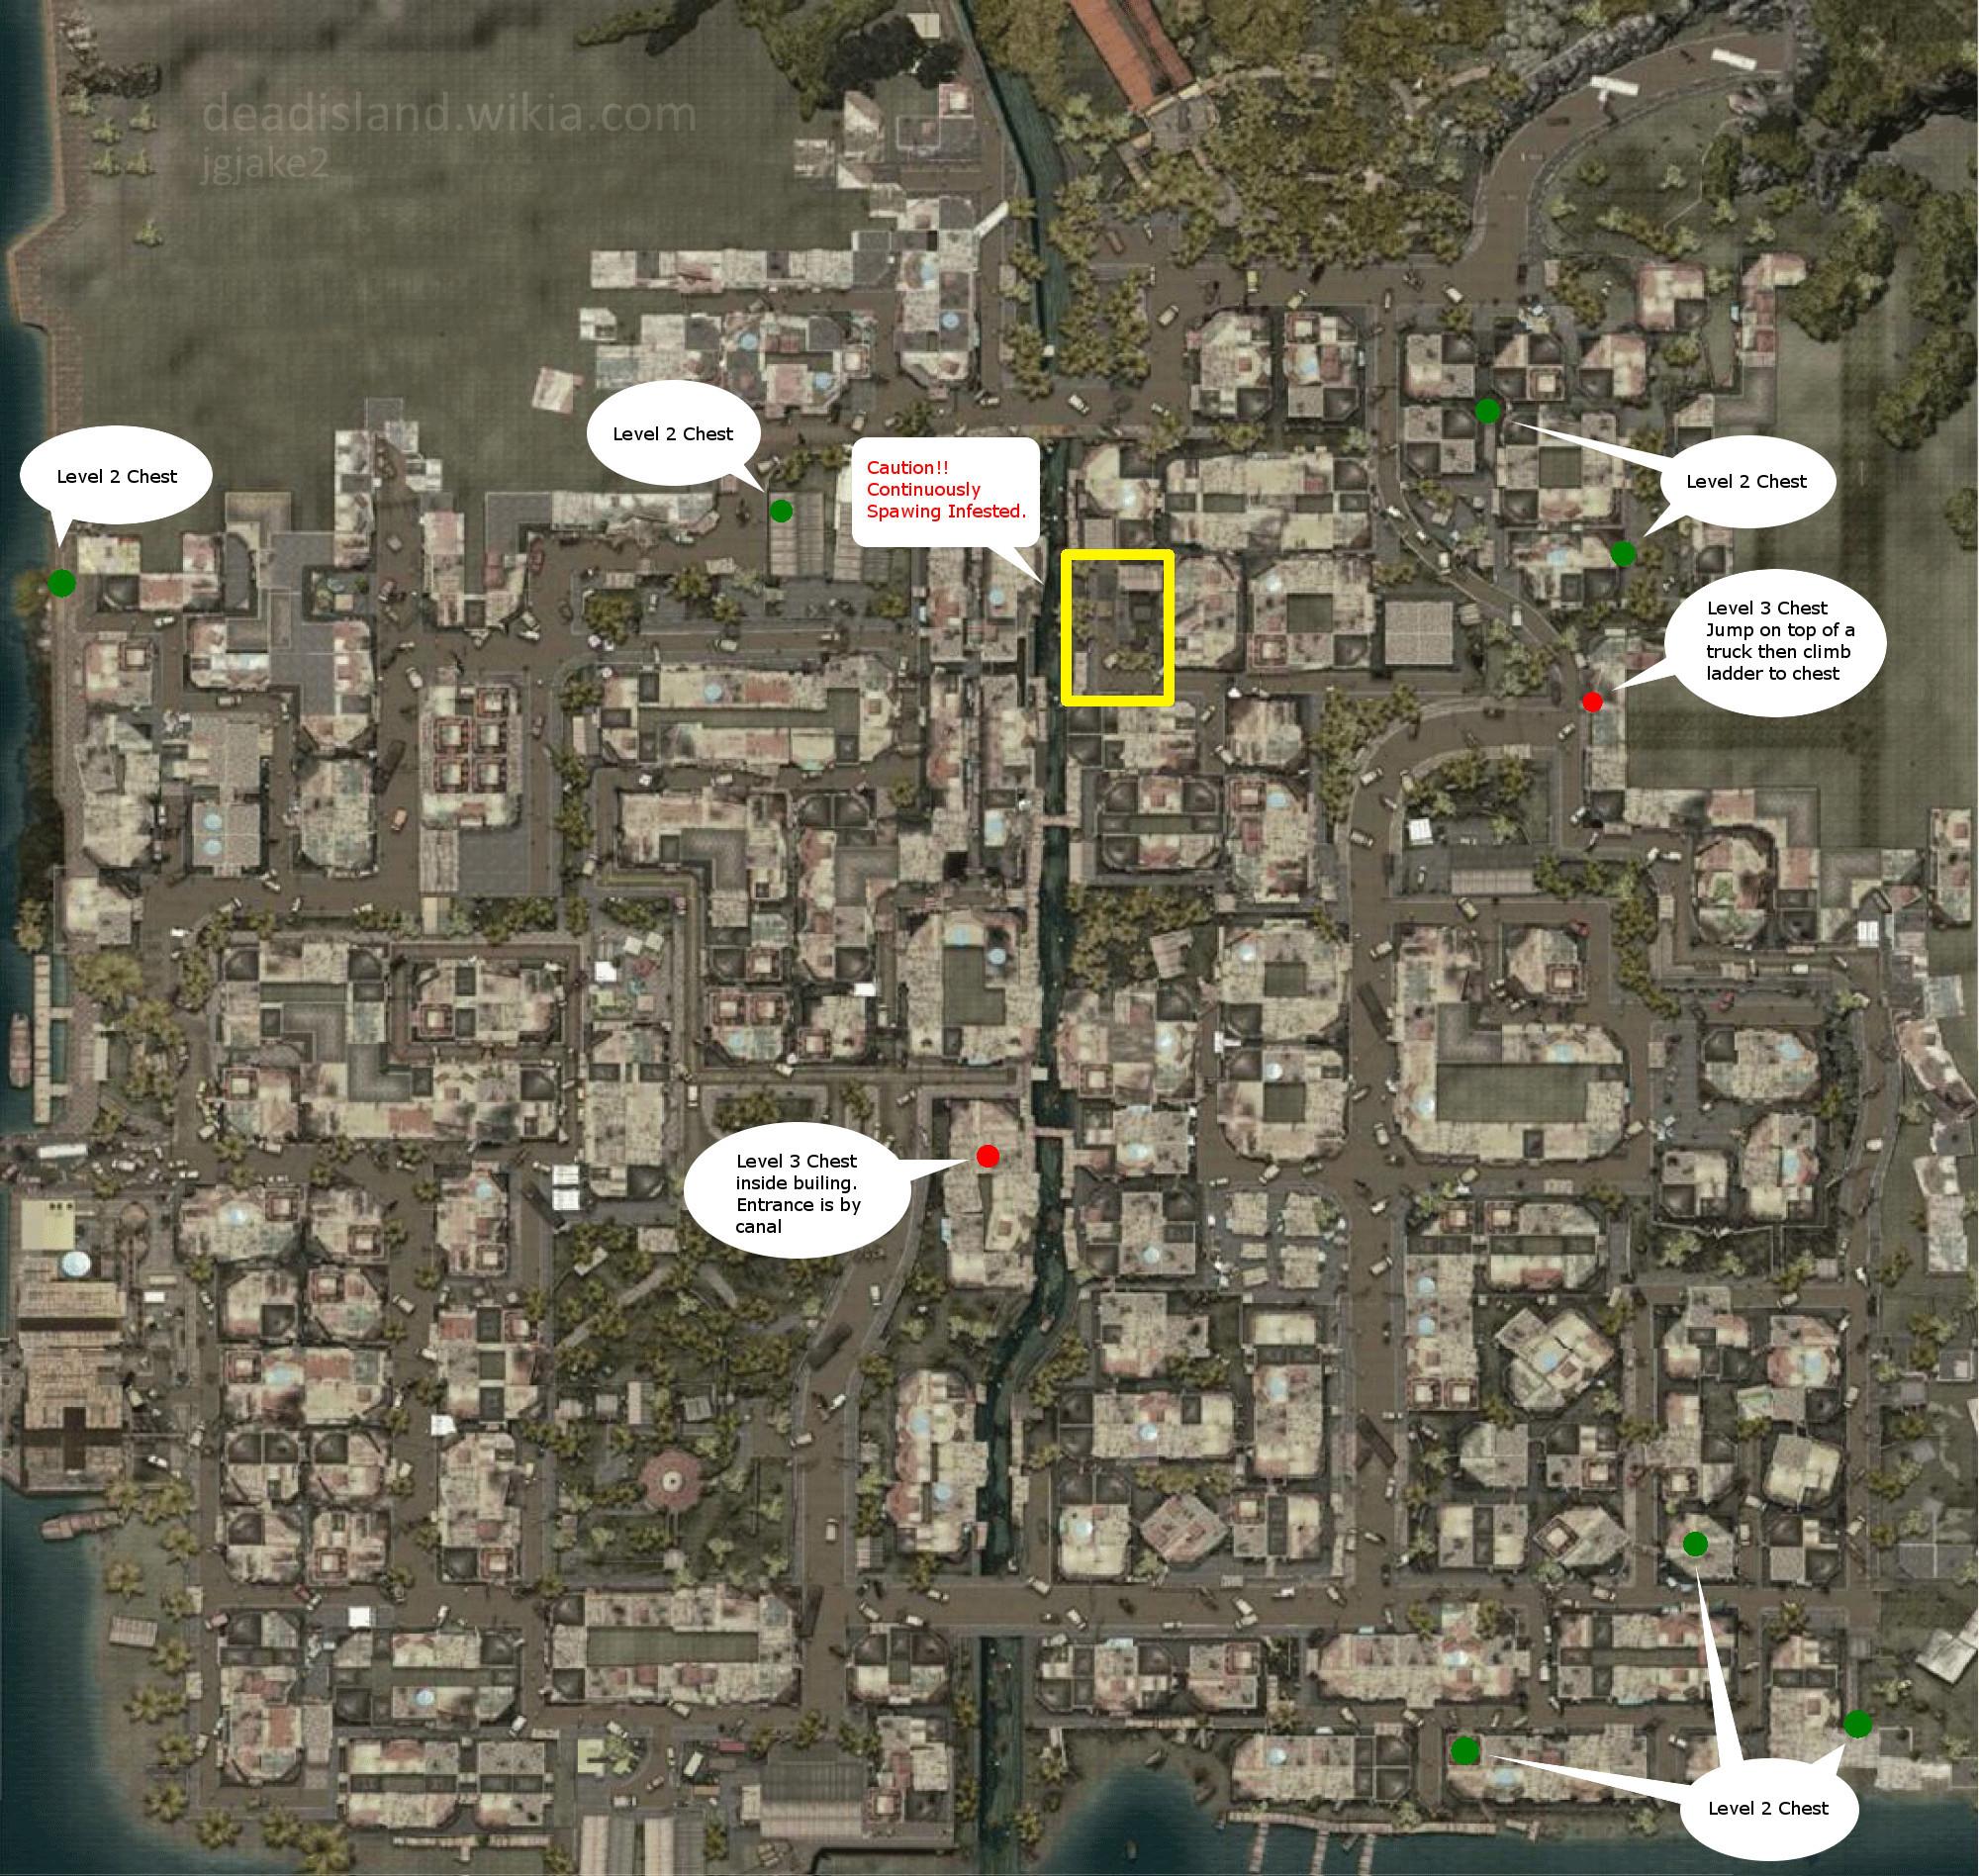 Dead Island Riptide Karte | filmgroephetaccent on